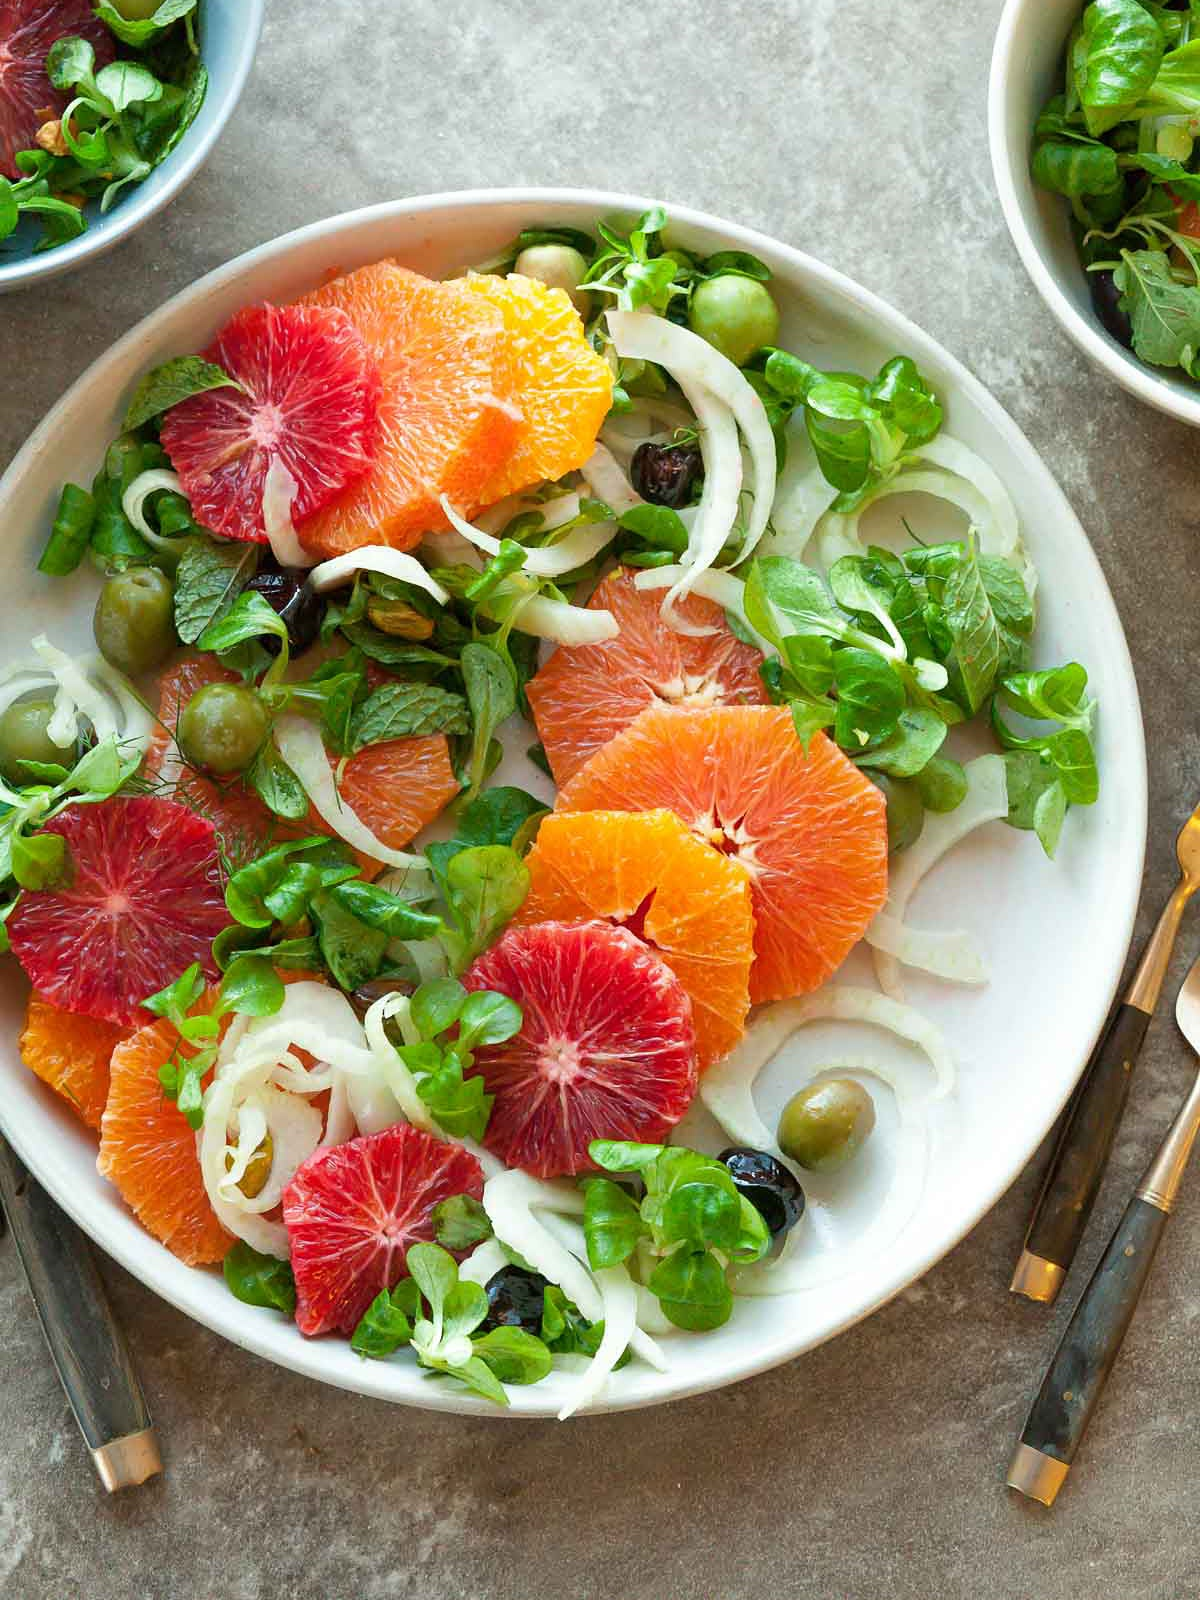 7 Citrus Salads That Will Brighten Up Your Winter